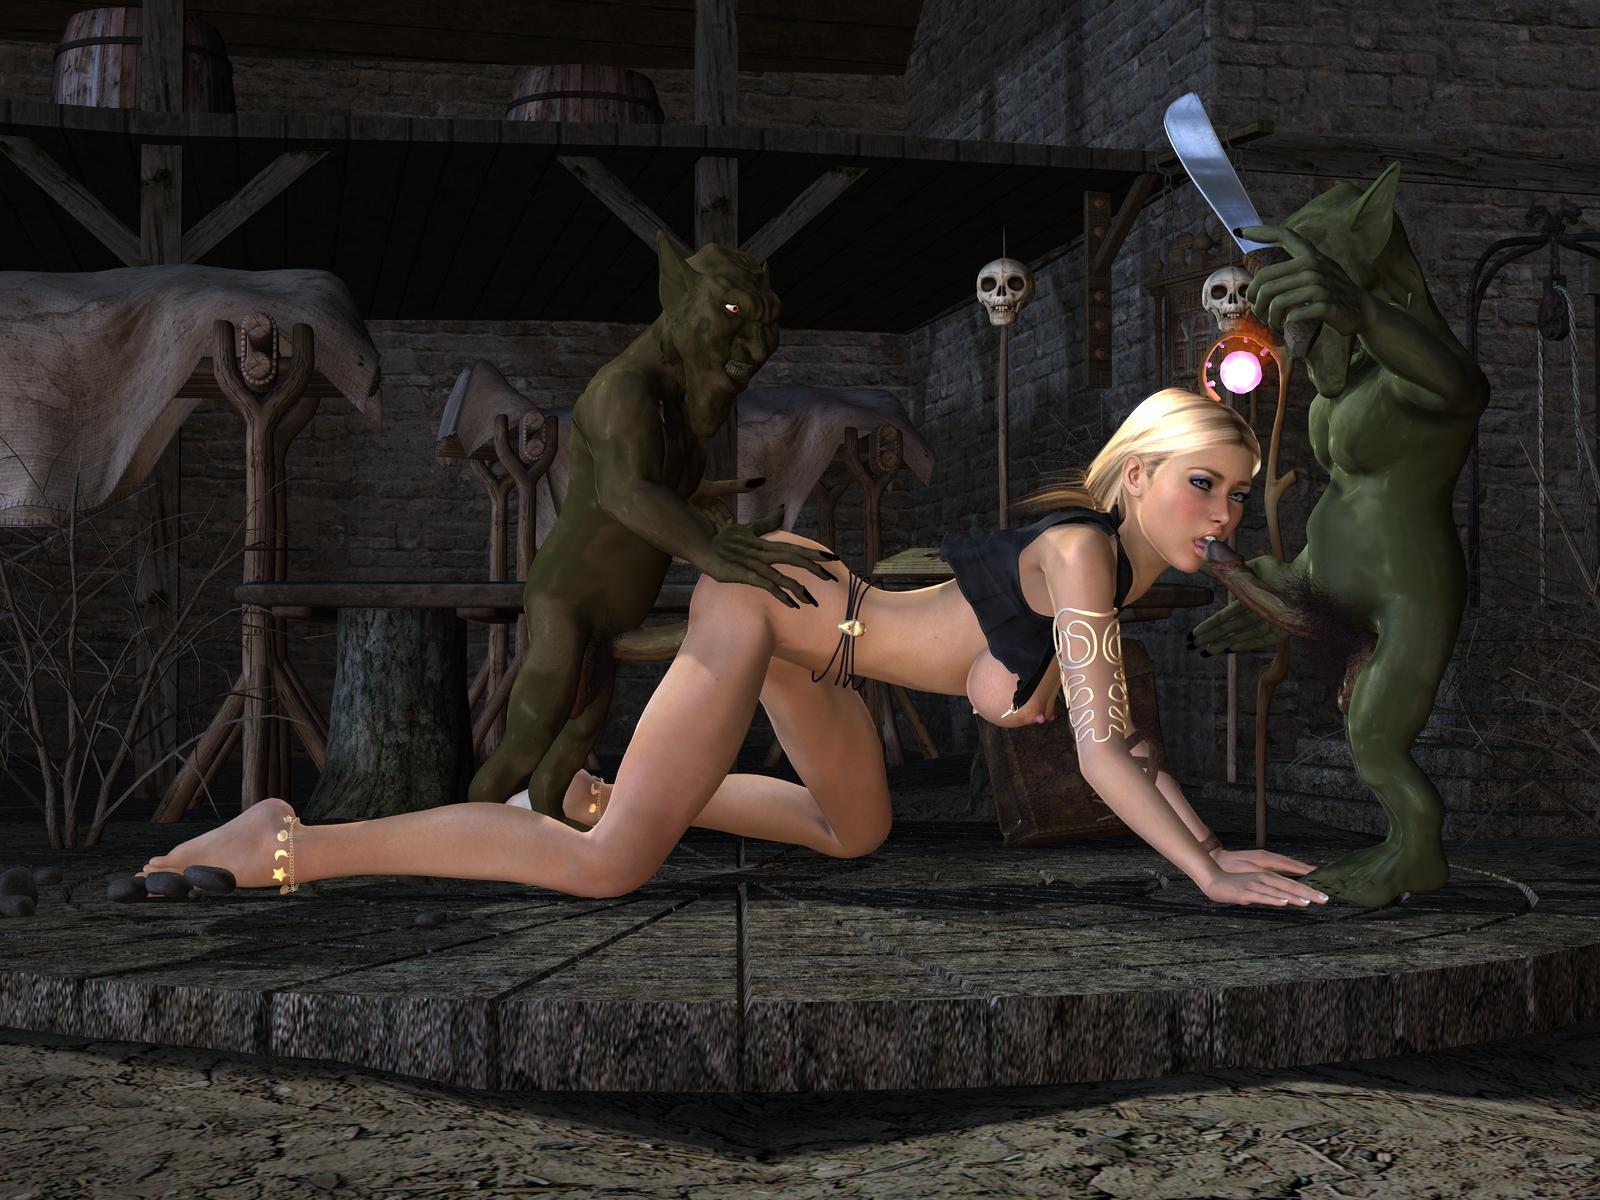 Sex story with goblins porno stripper